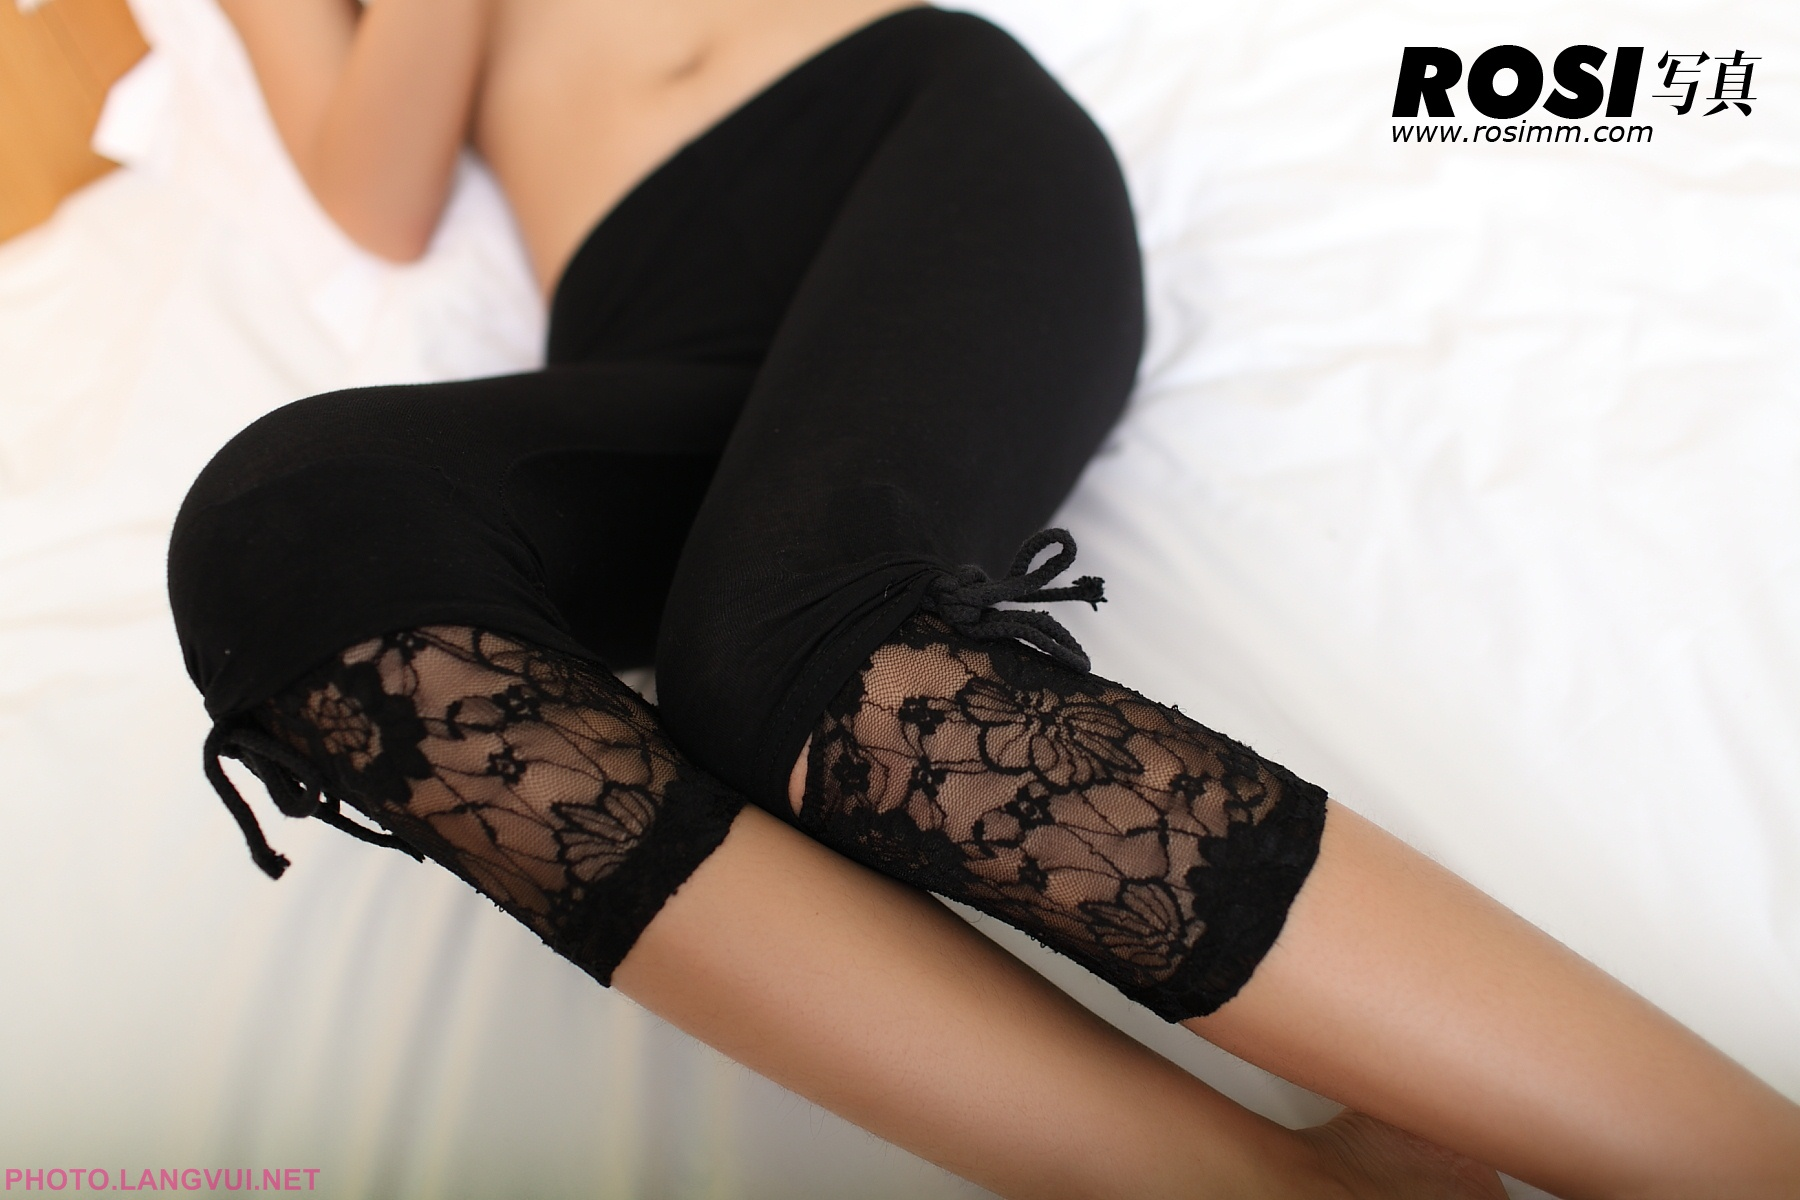 ROSI No 224